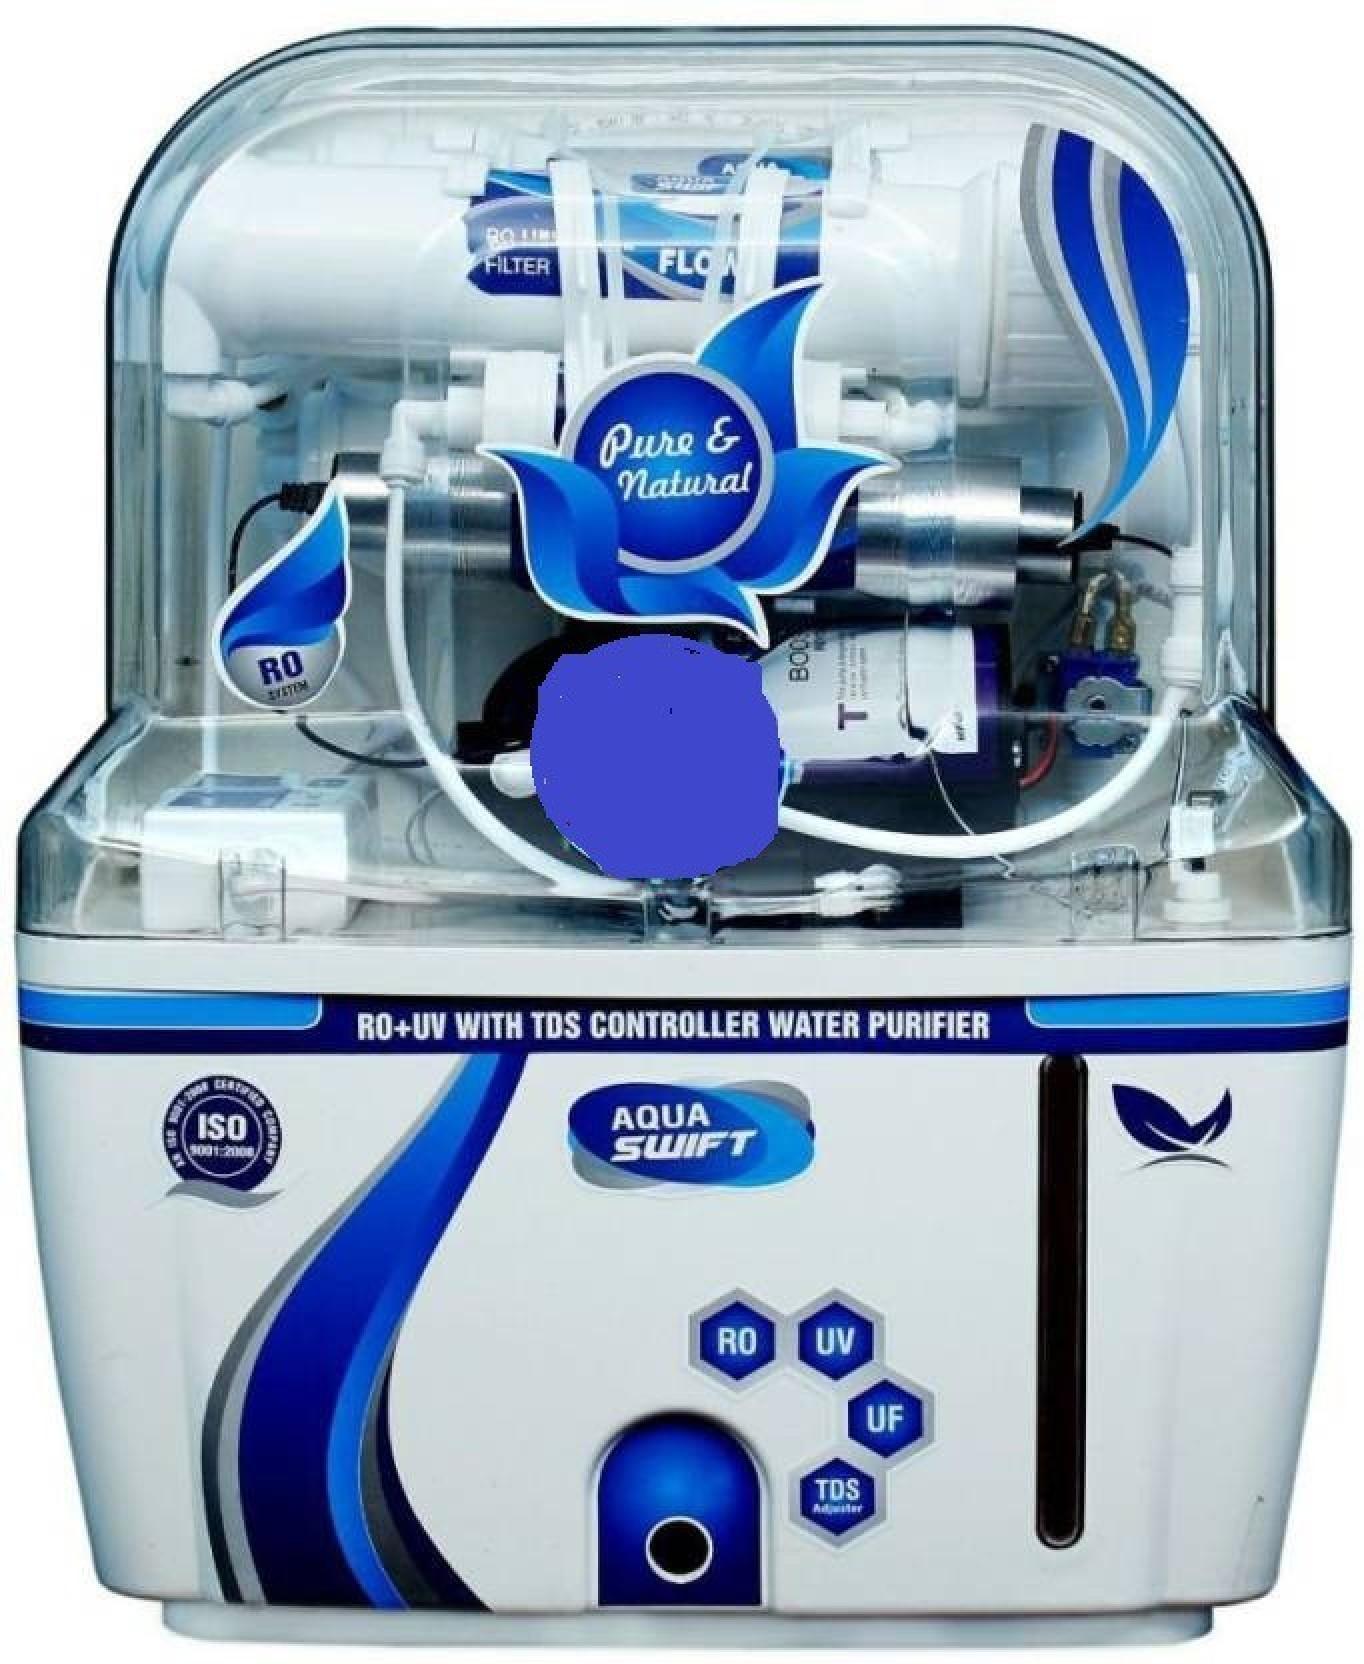 Aquaguard ( BLUE 12 ) liters. 10 L RO + UV + UF + TDS, Gravity Based ...